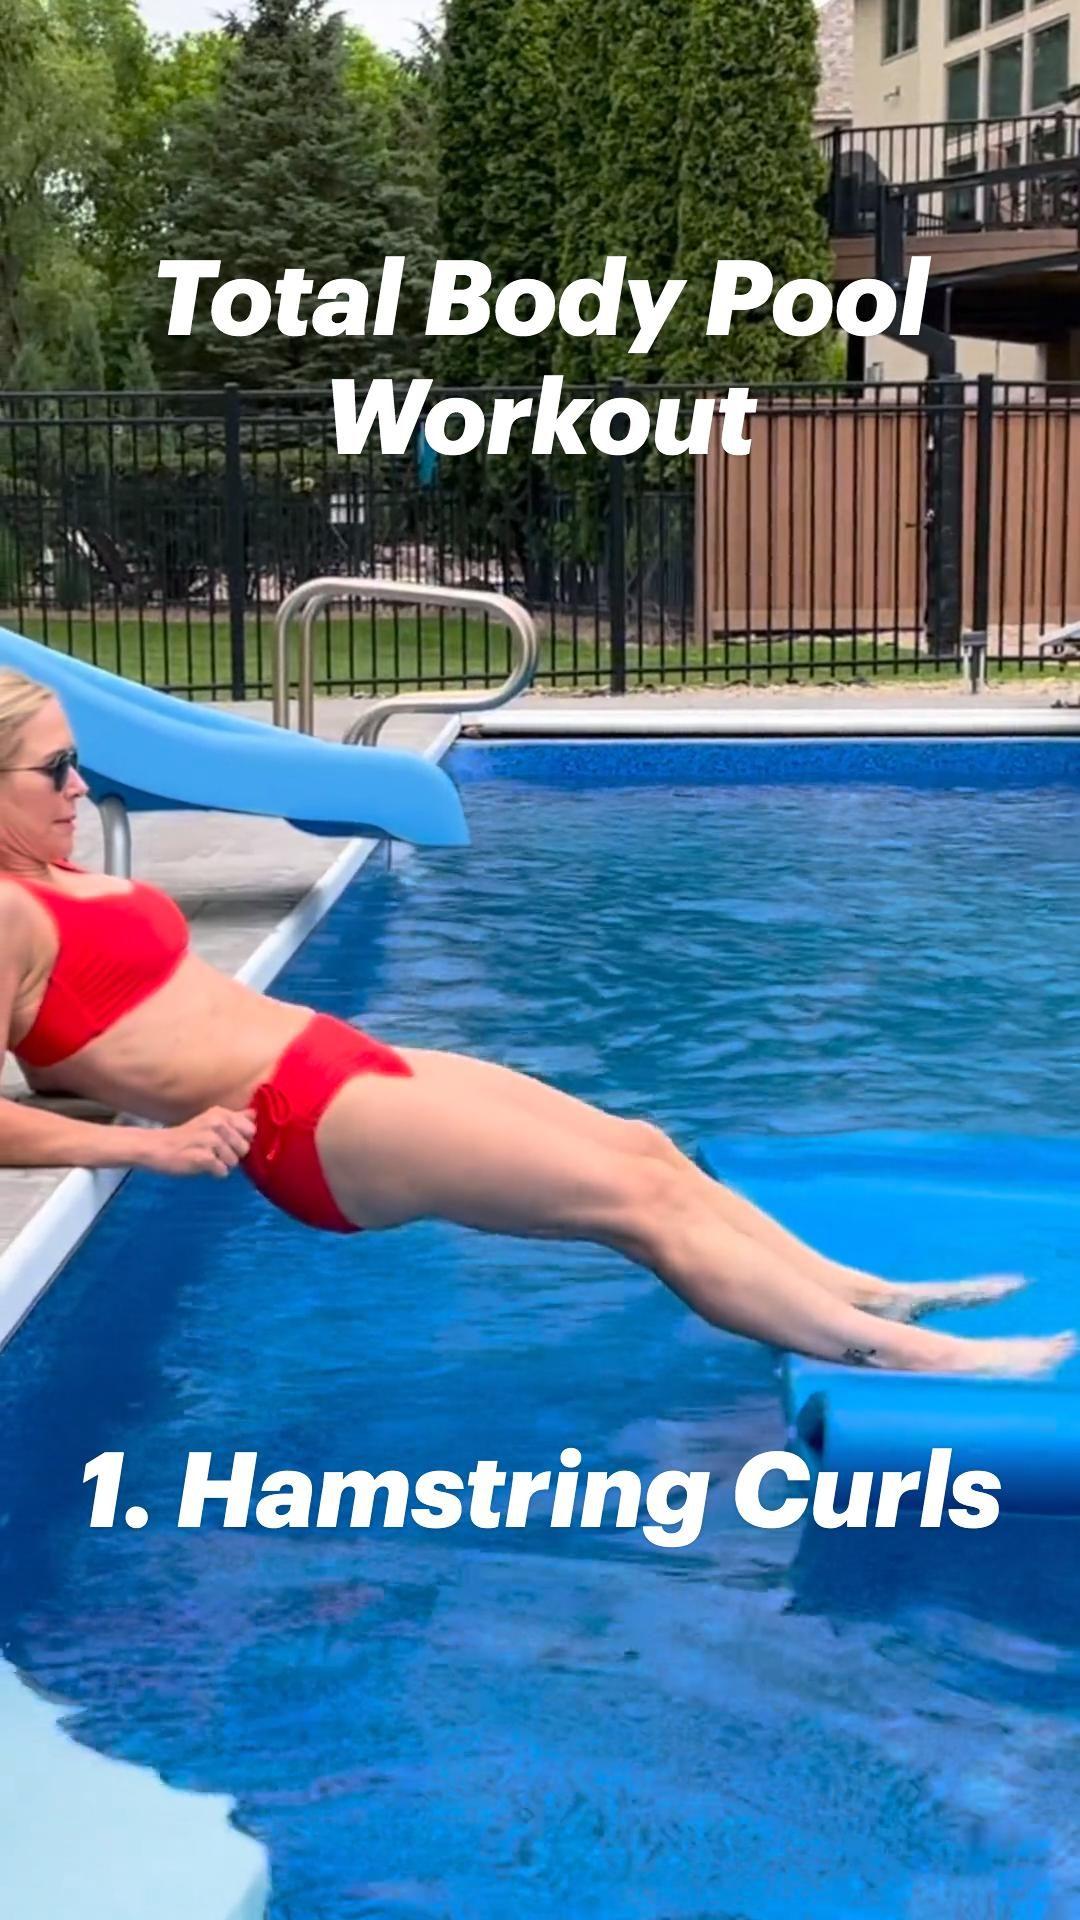 Total Body Pool Workout